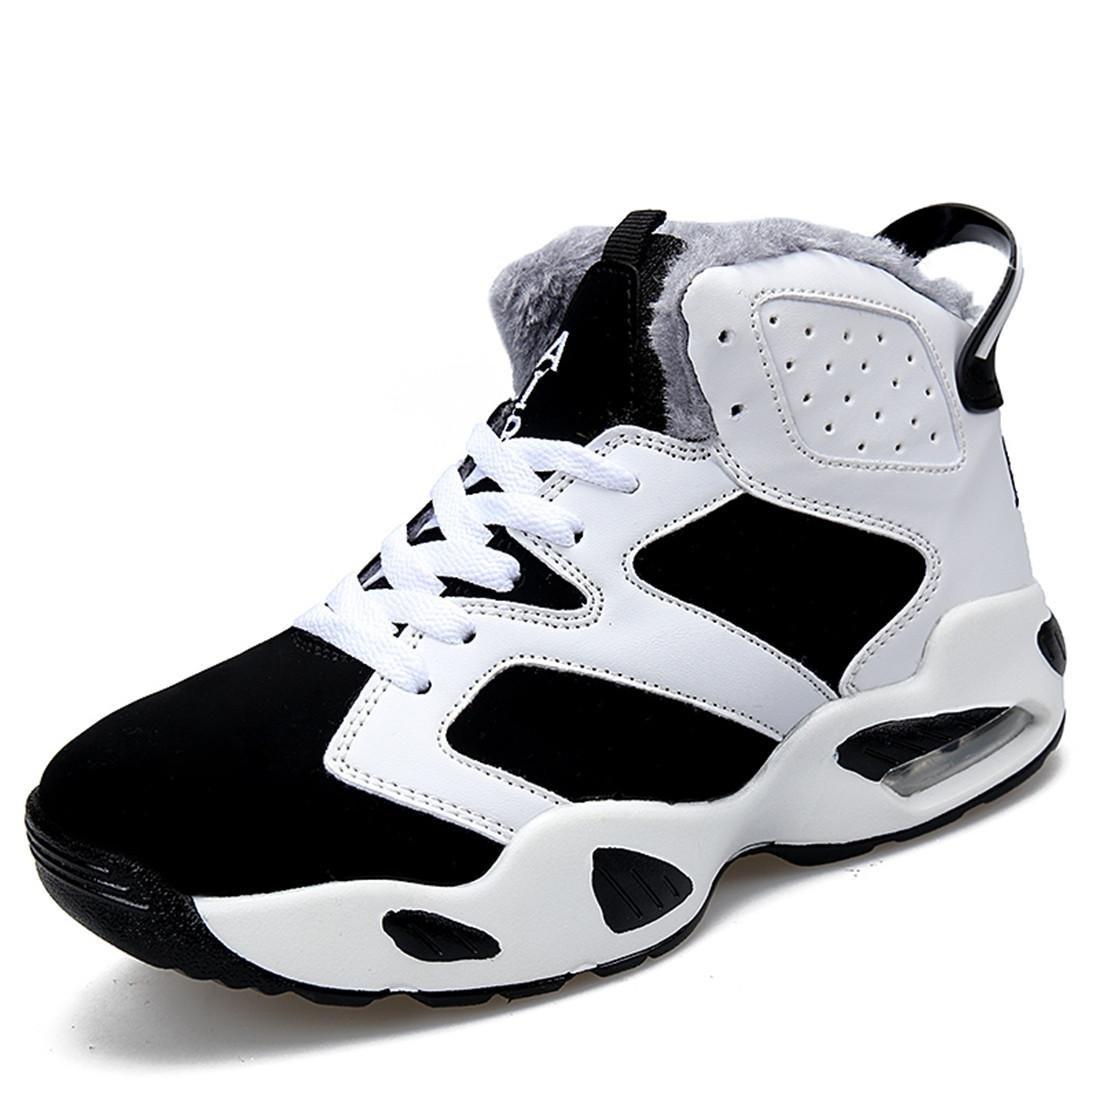 Herren Sportschuhe Ausbildung Atmungsaktiv Erhöht Basketball Schuhe Turnschuhe Trainer Plus Kaschmir Warm halten Schutzfuß EUR GRÖSSE 33-45